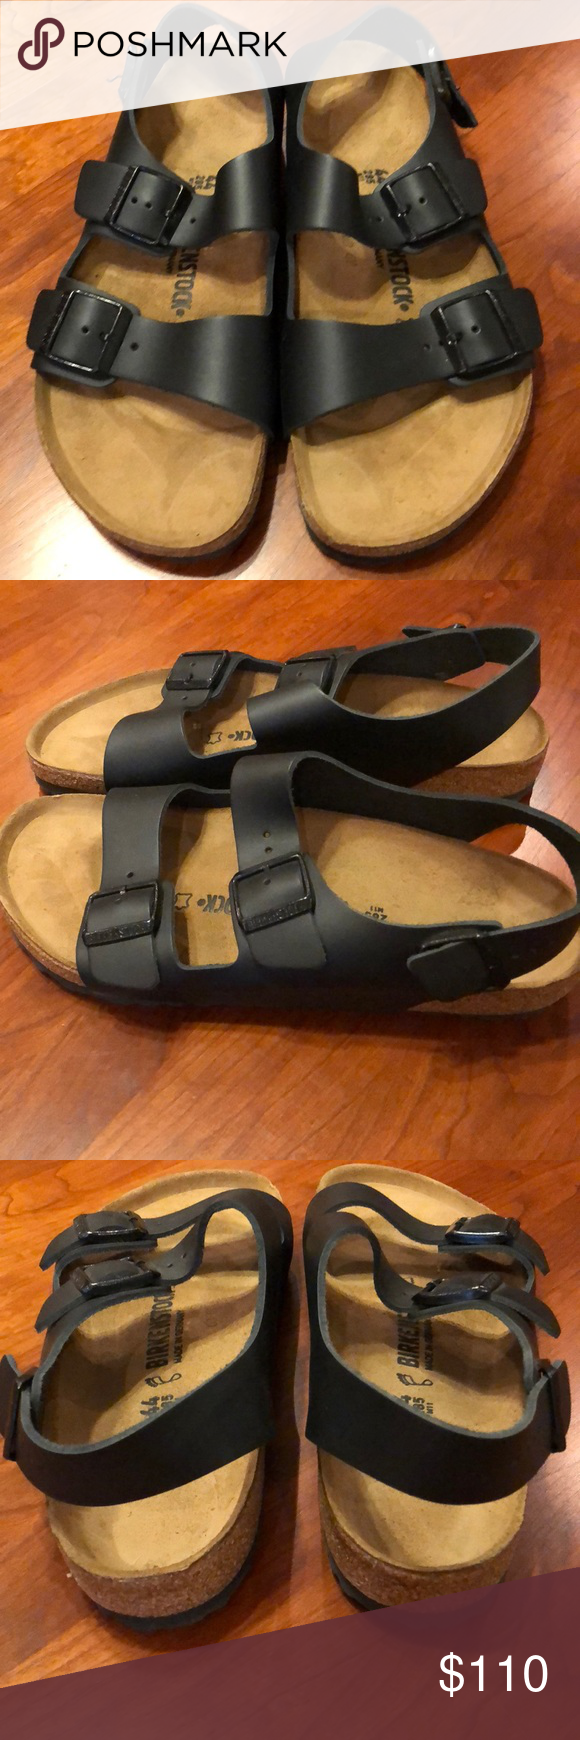 Dansko nero sandals 40   My Posh Closet Closet Posh   Pinterest 4fe9d1